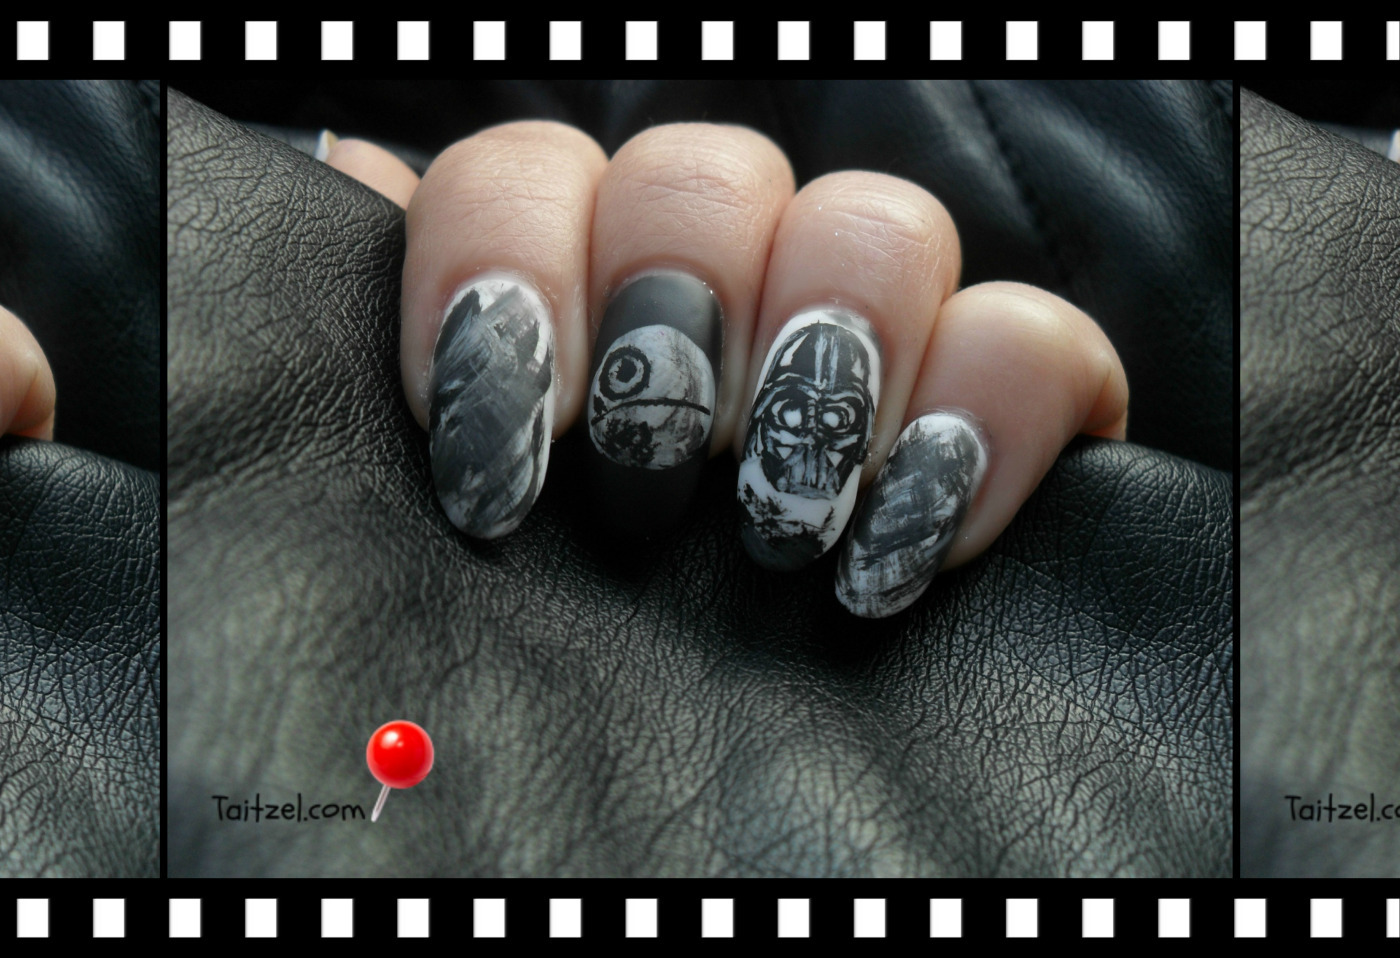 Nail art Marathon - Movie nails - Manichiura cu Star Wars - Taitzel ...